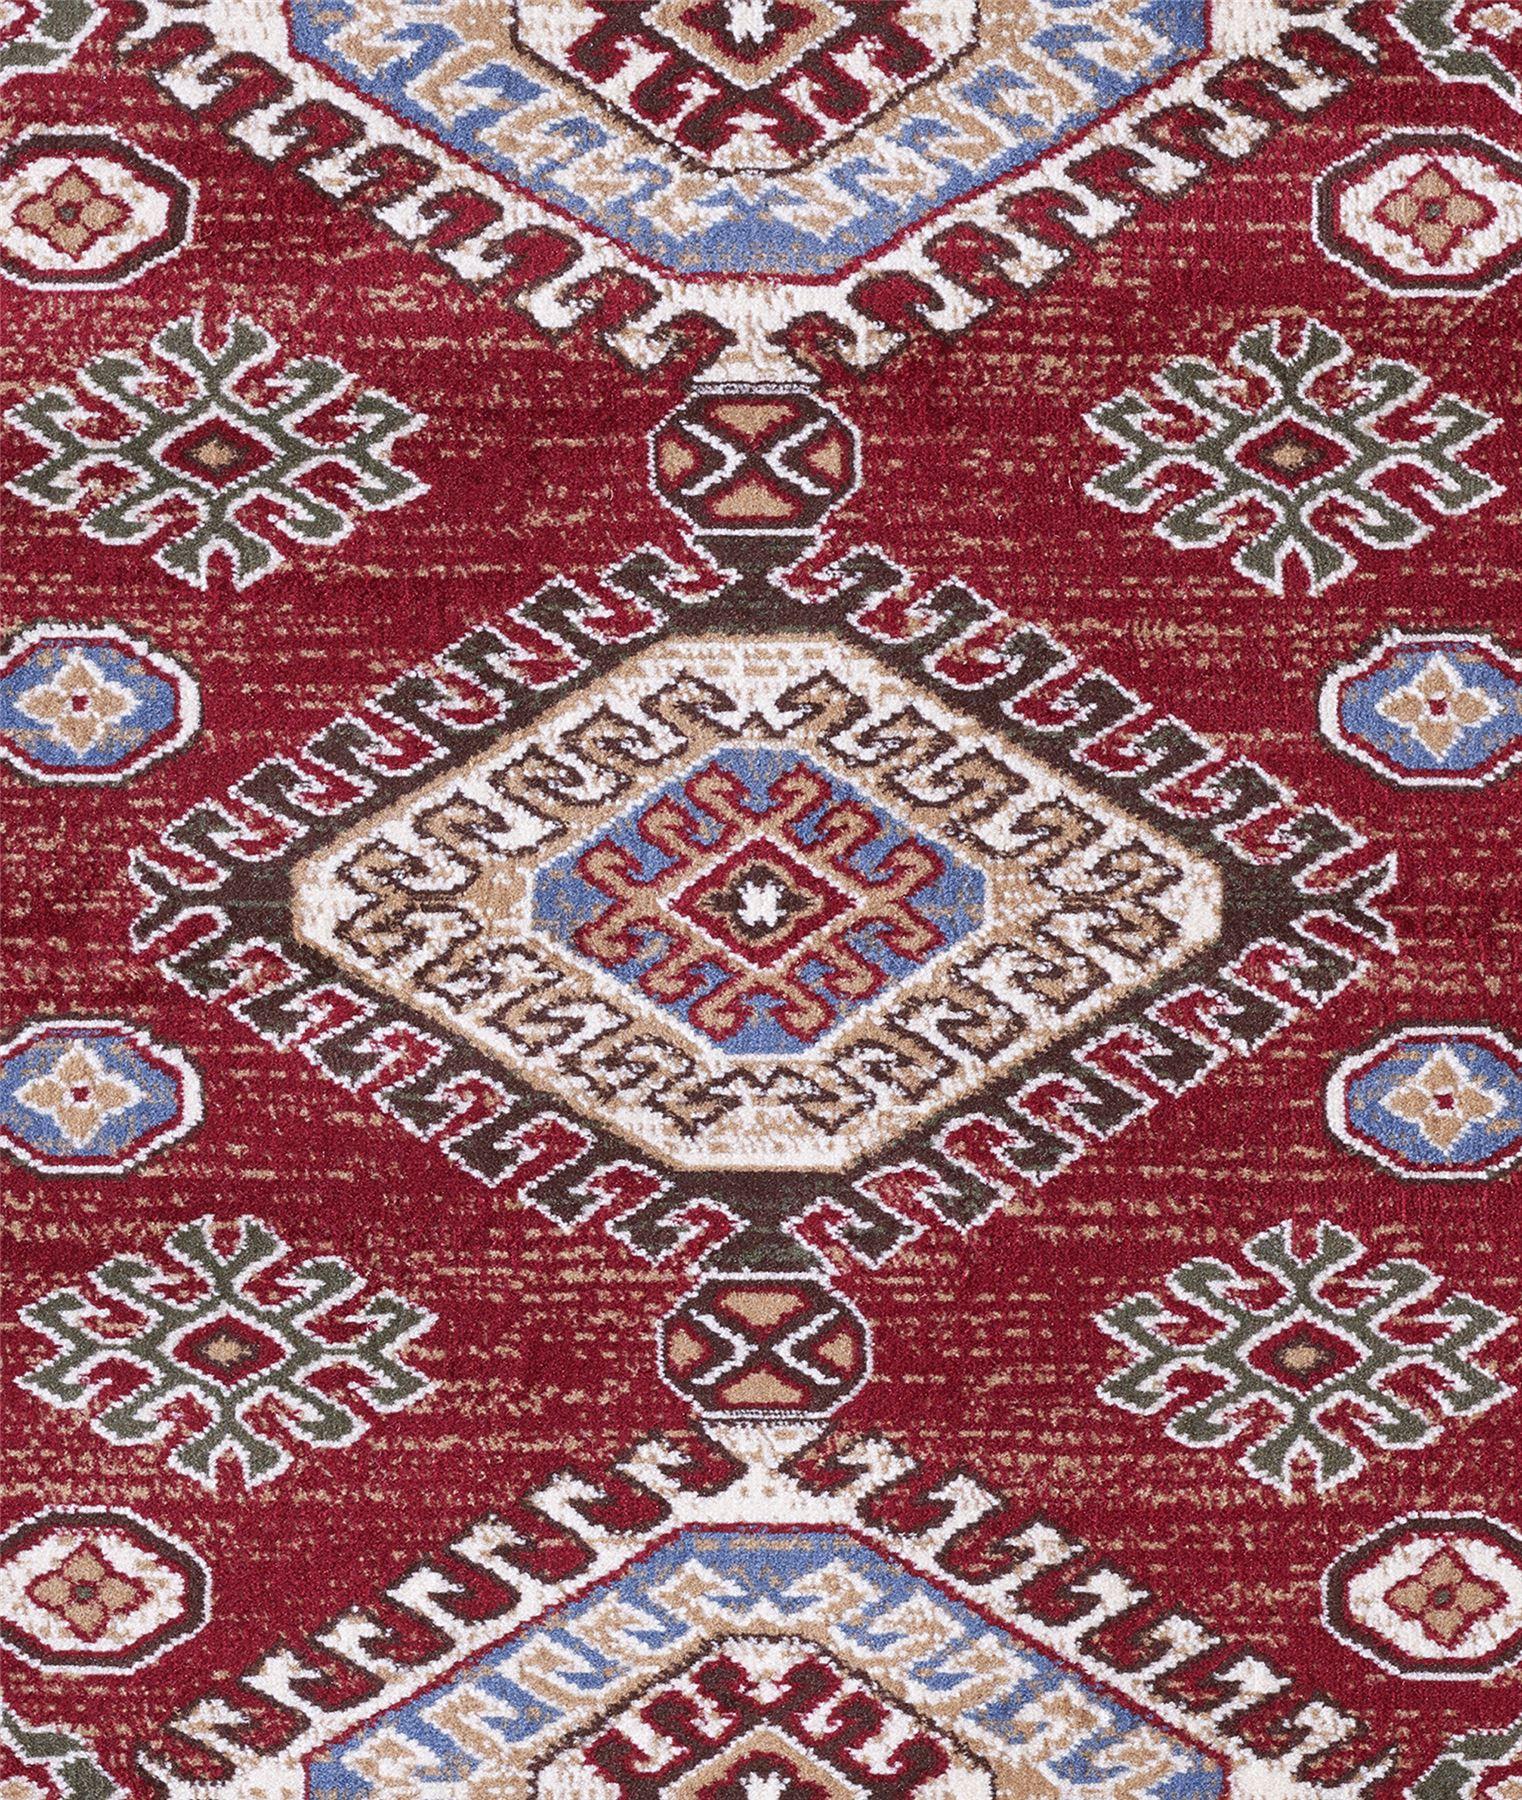 Traditionnel-Persan-Tapis-Oriental-Medaillon-Design-Tapis-Rouge-Bleu-Tapis-de-sol